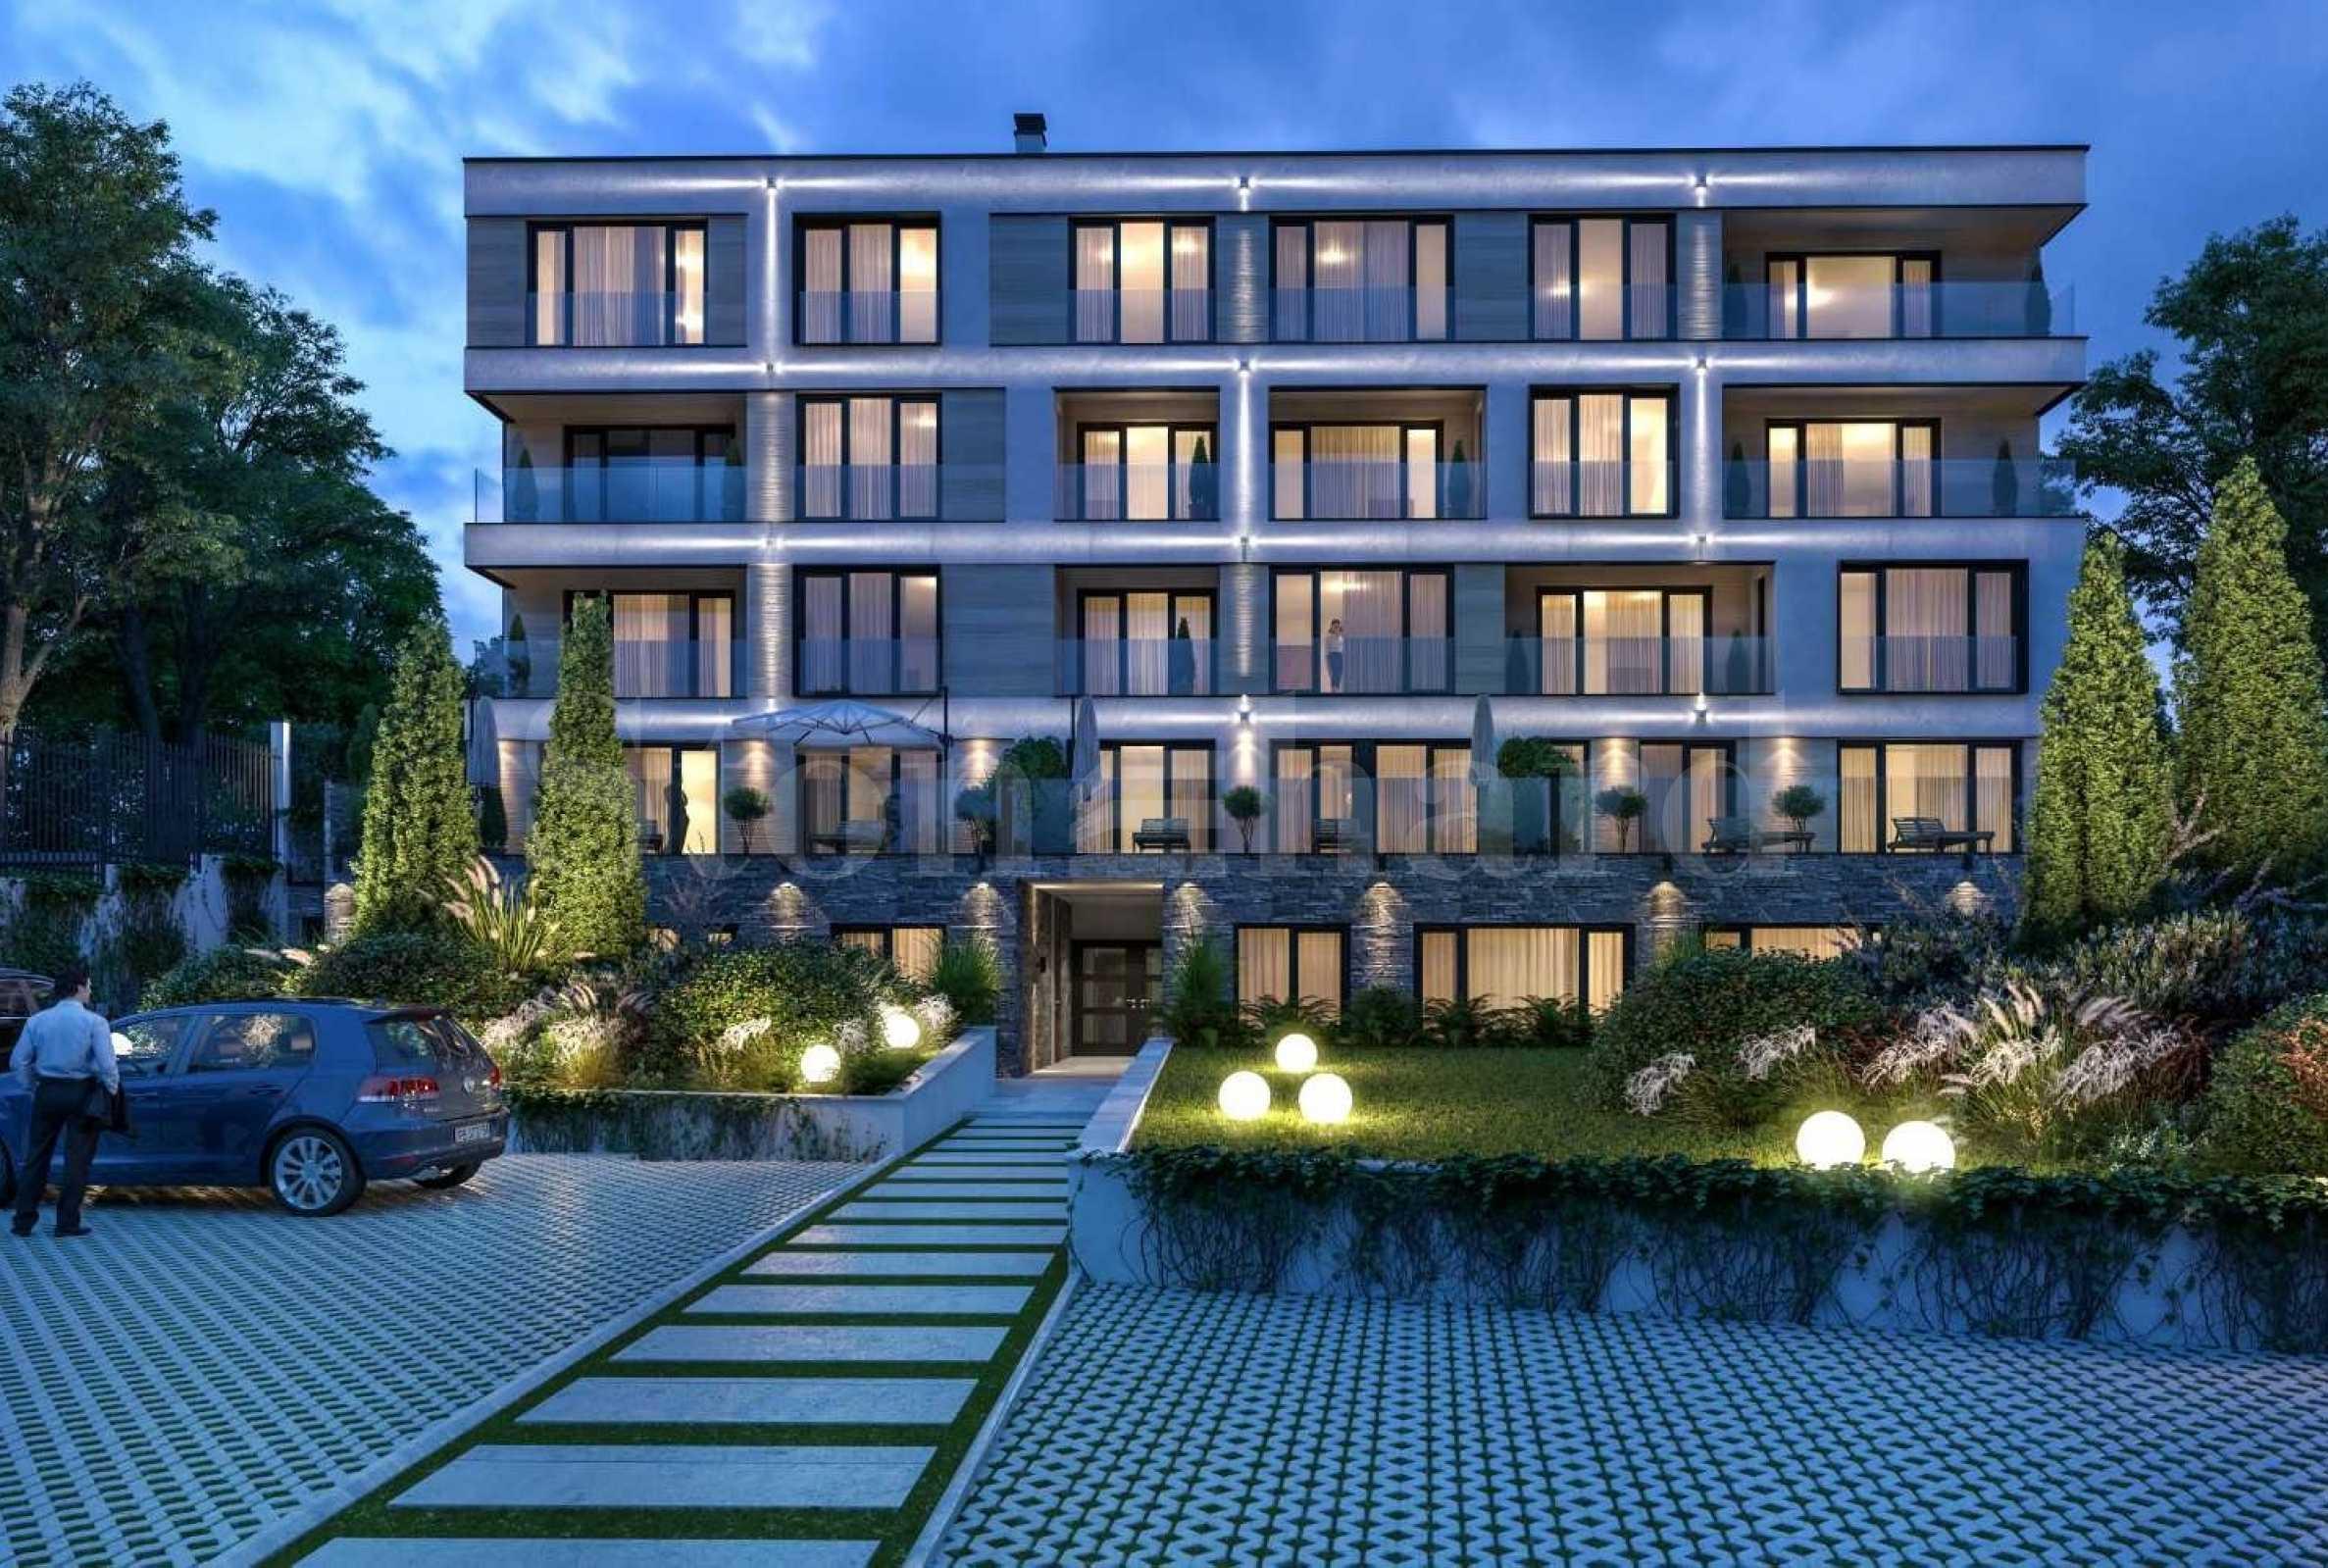 Апартаменти в бутикова сграда - качество и стил в кв. Бриз-Юг2 - Stonehard